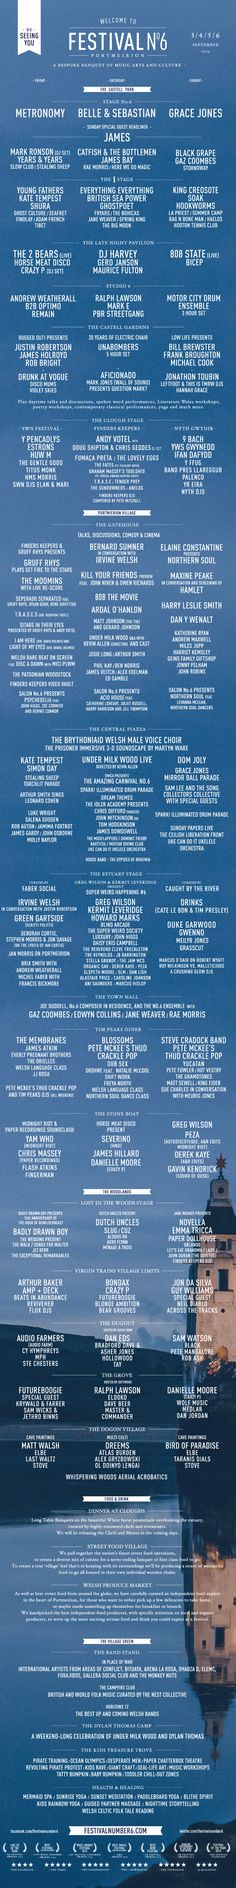 Festival No 6 | A Bespoke Banquet Of Music, Arts & Culture